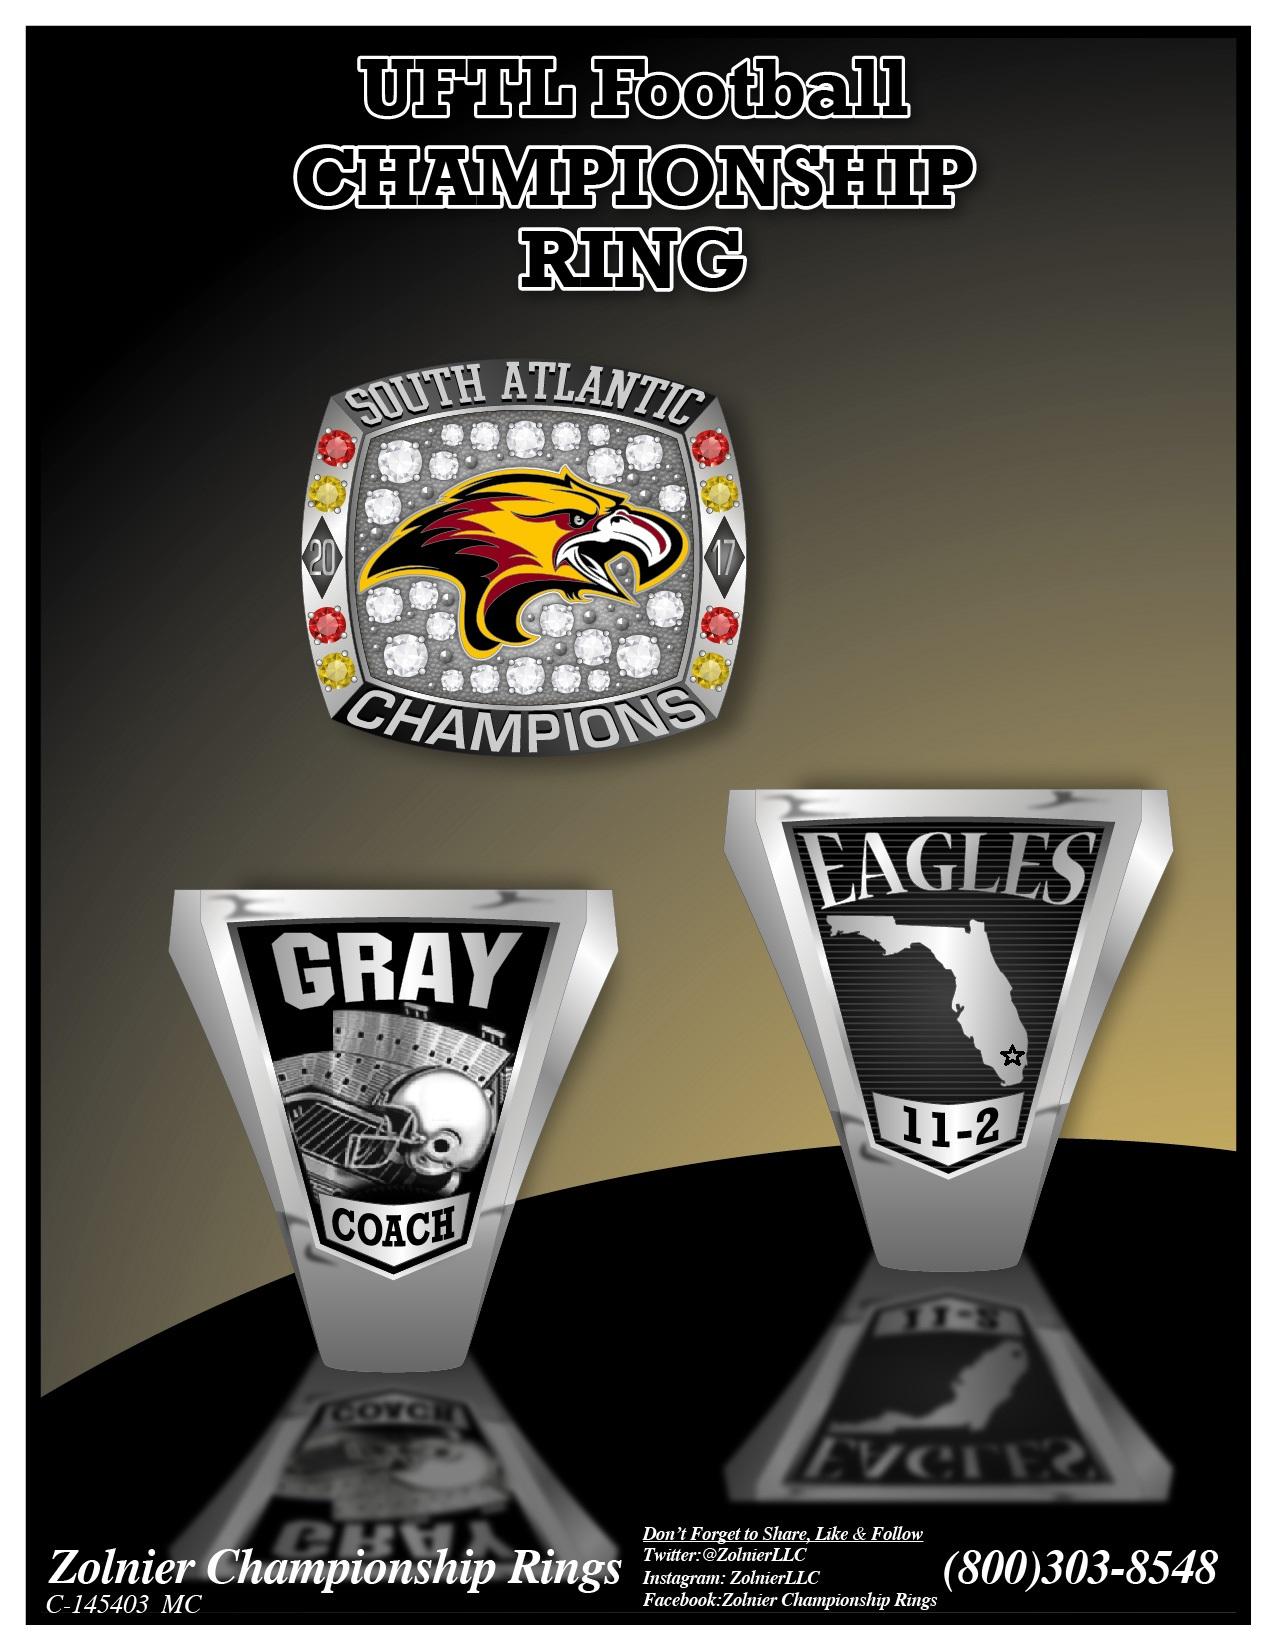 C-145403 UFTL Football Champ Ring